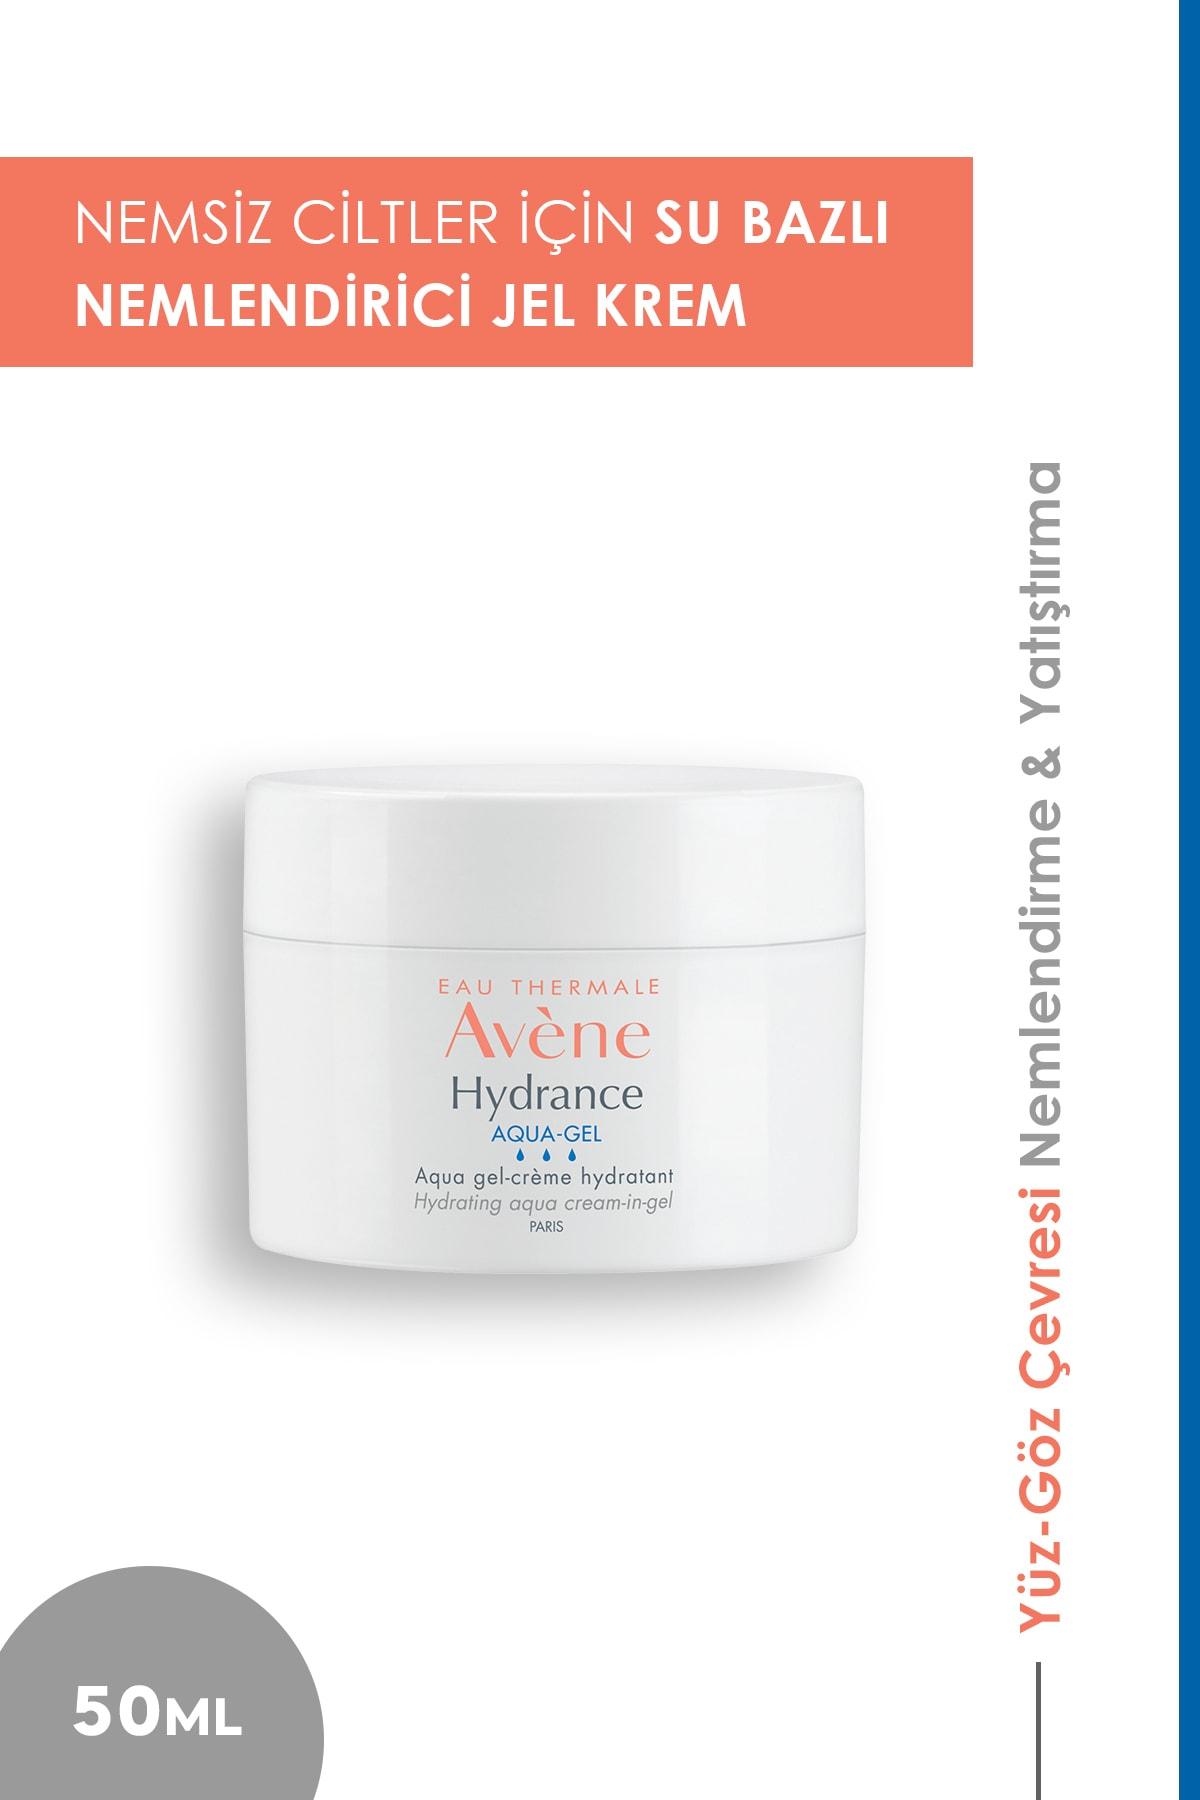 Avene Hydrance Aqua Gel Cream 50ml 1